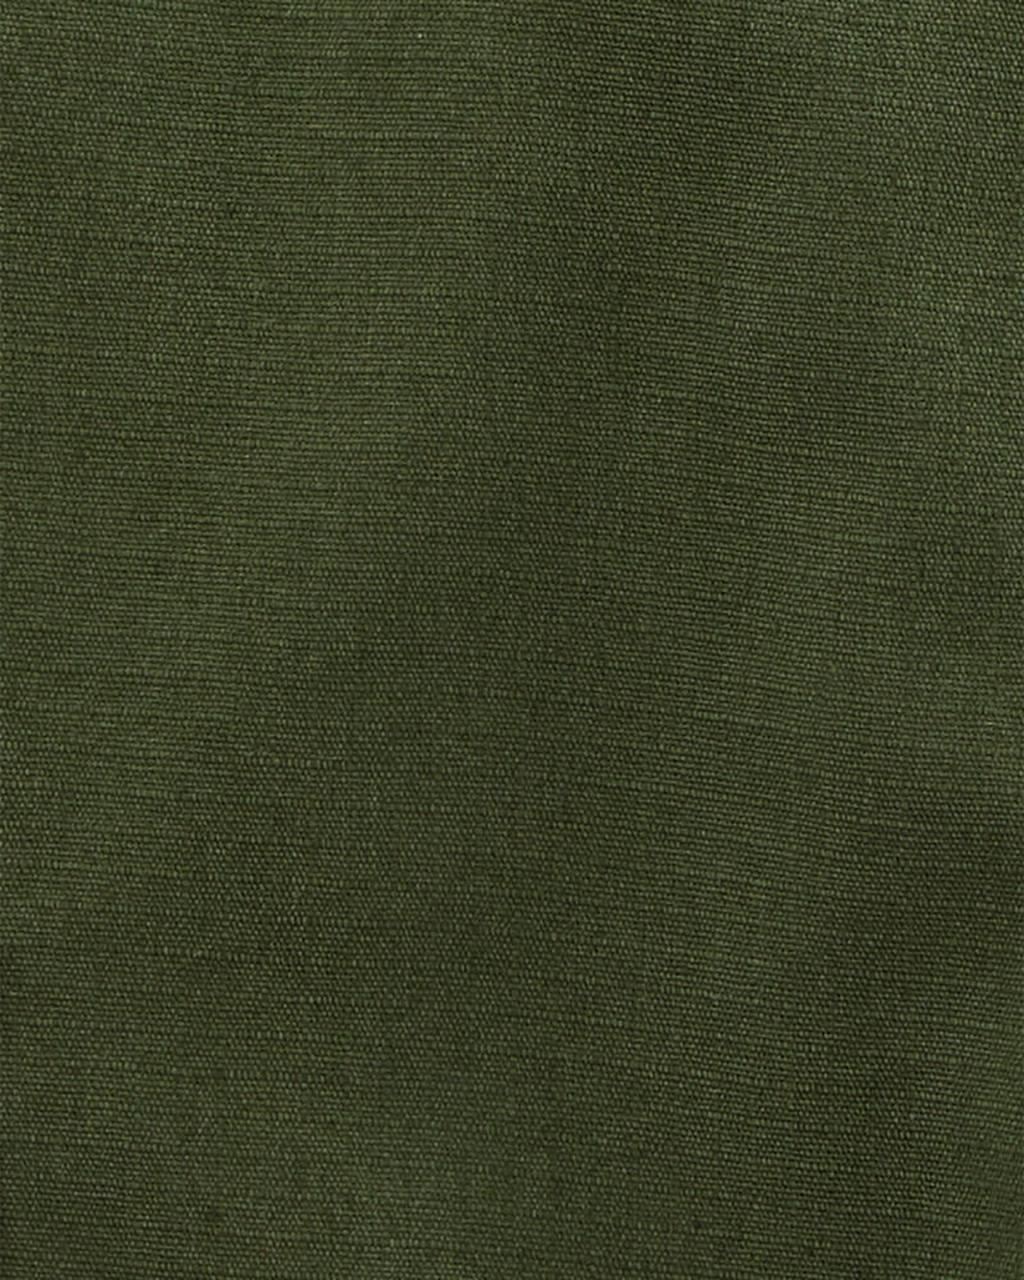 Jardineira Selva